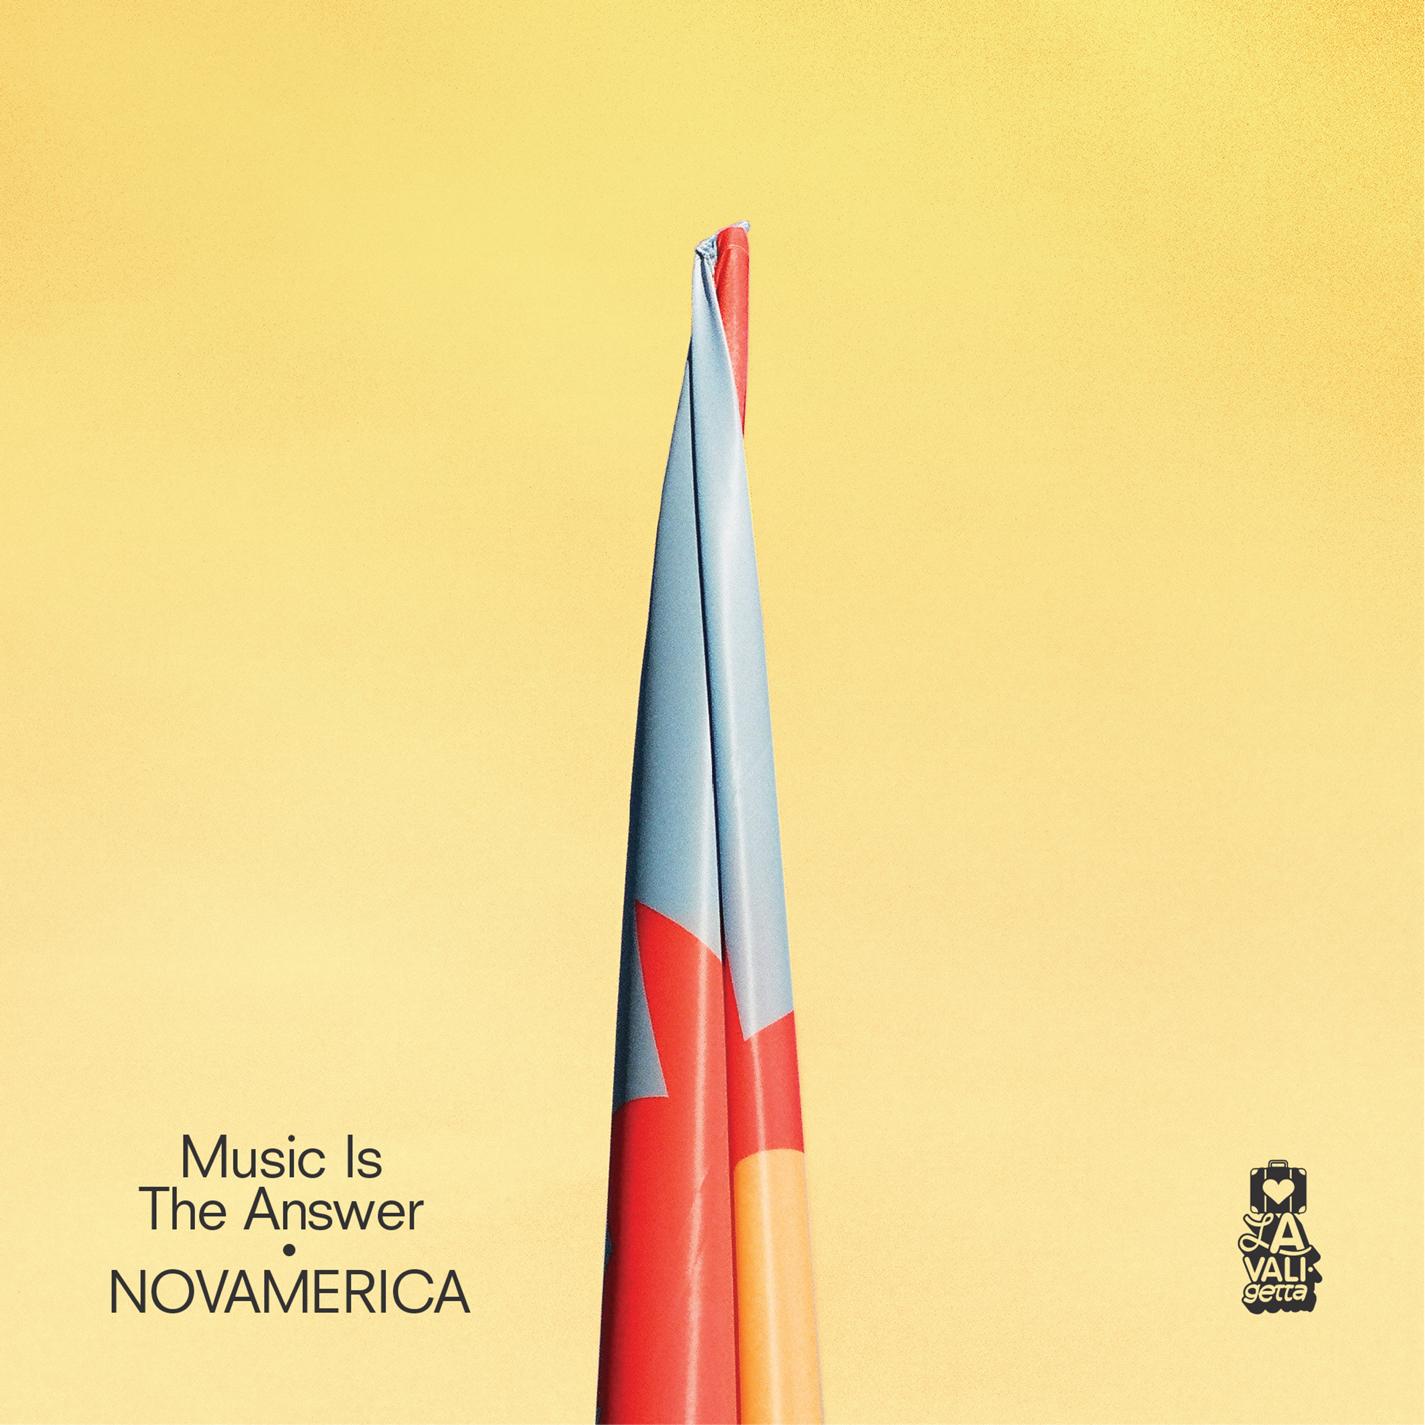 DV055 / Novamerica - Music is the Answer